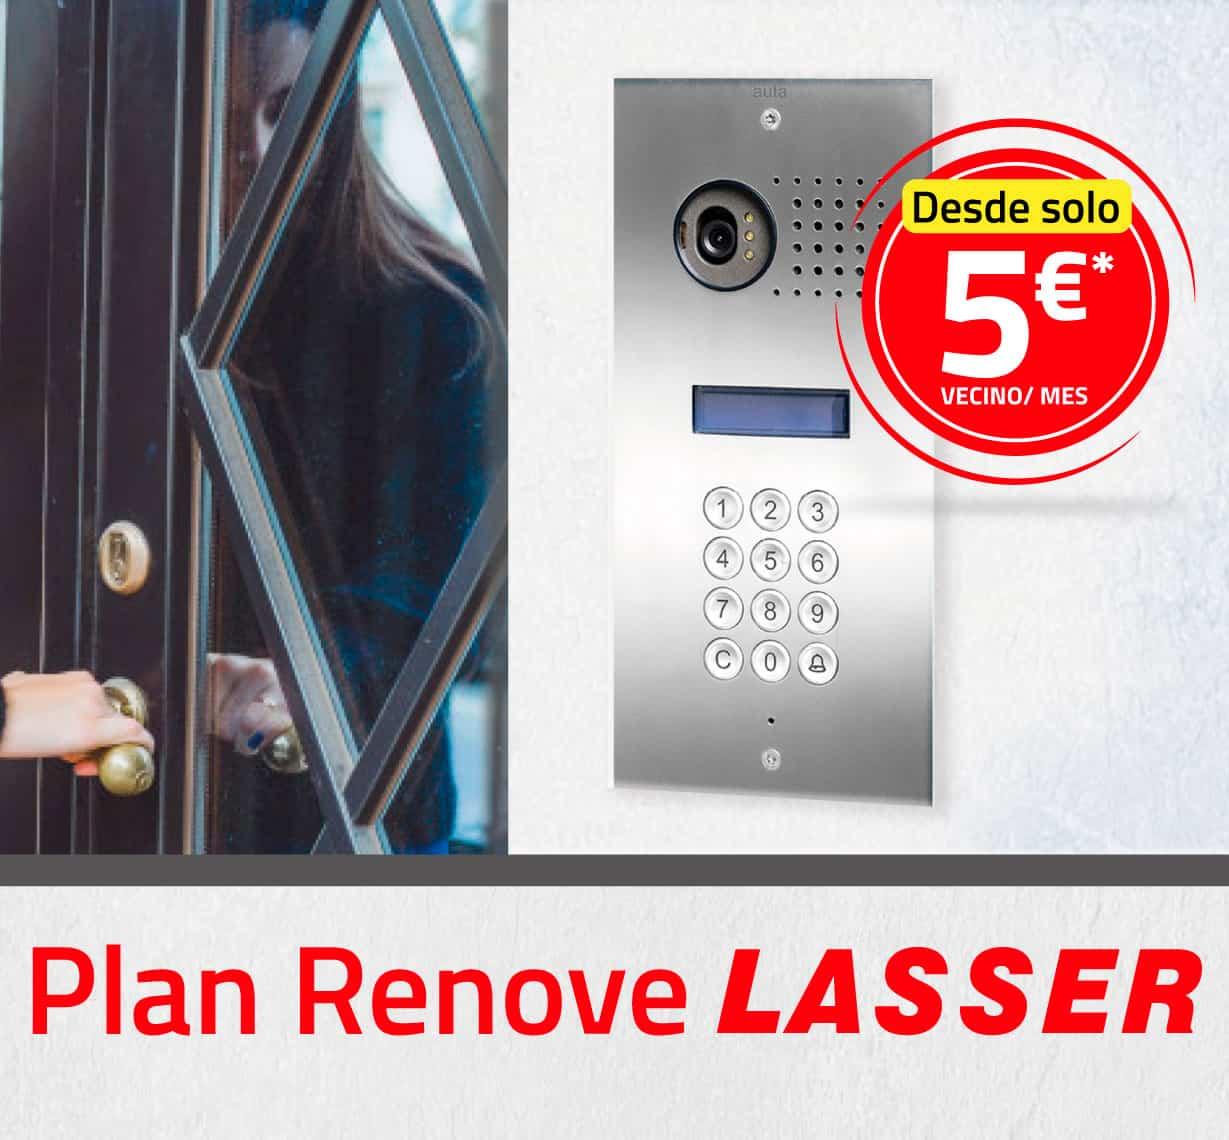 plan-renove-5euros-3-videoportero-madrid